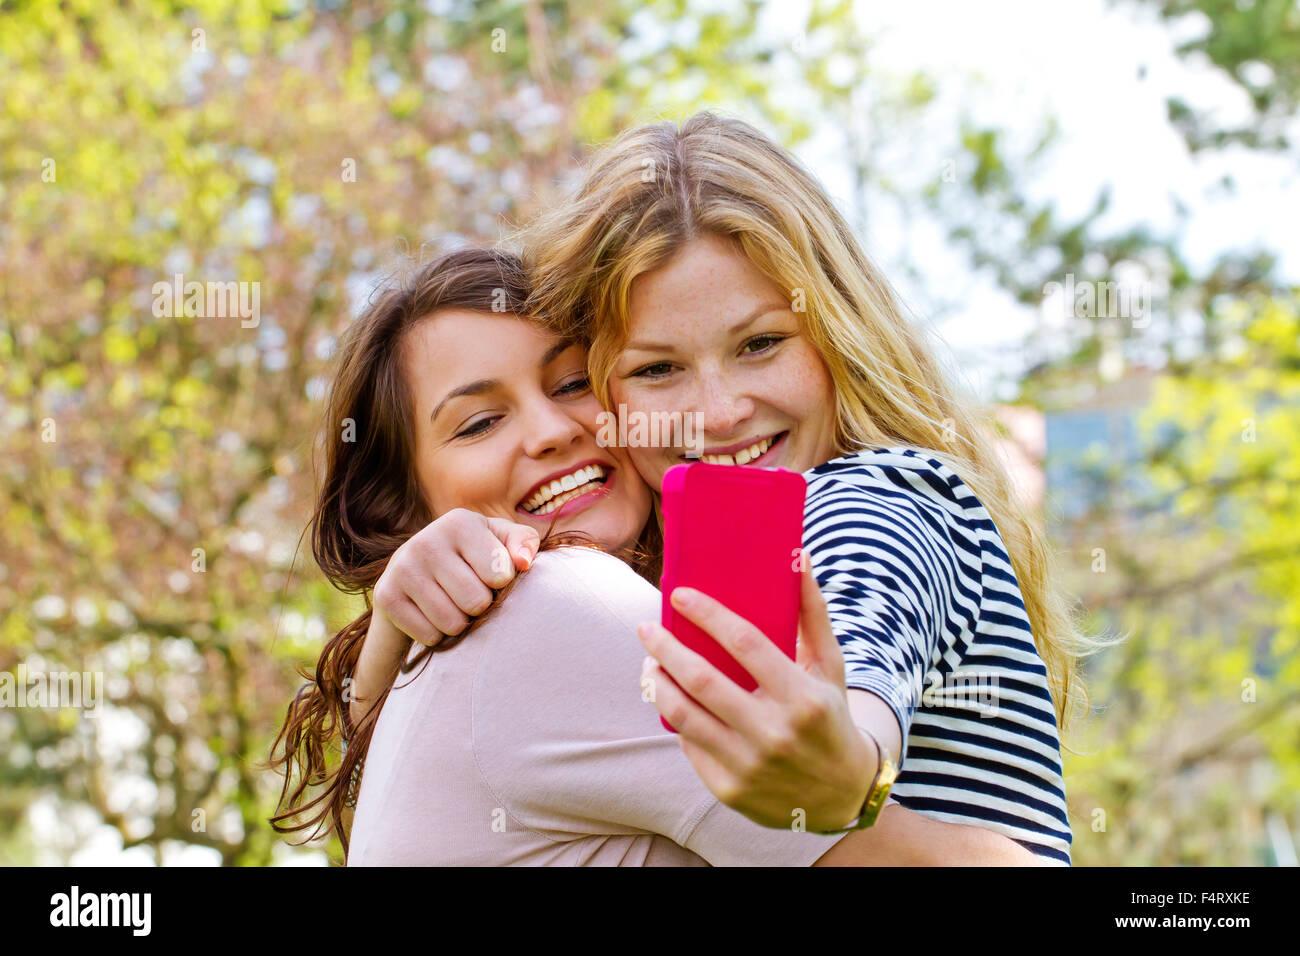 En tenant avec Smartphone Selfies Photo Stock